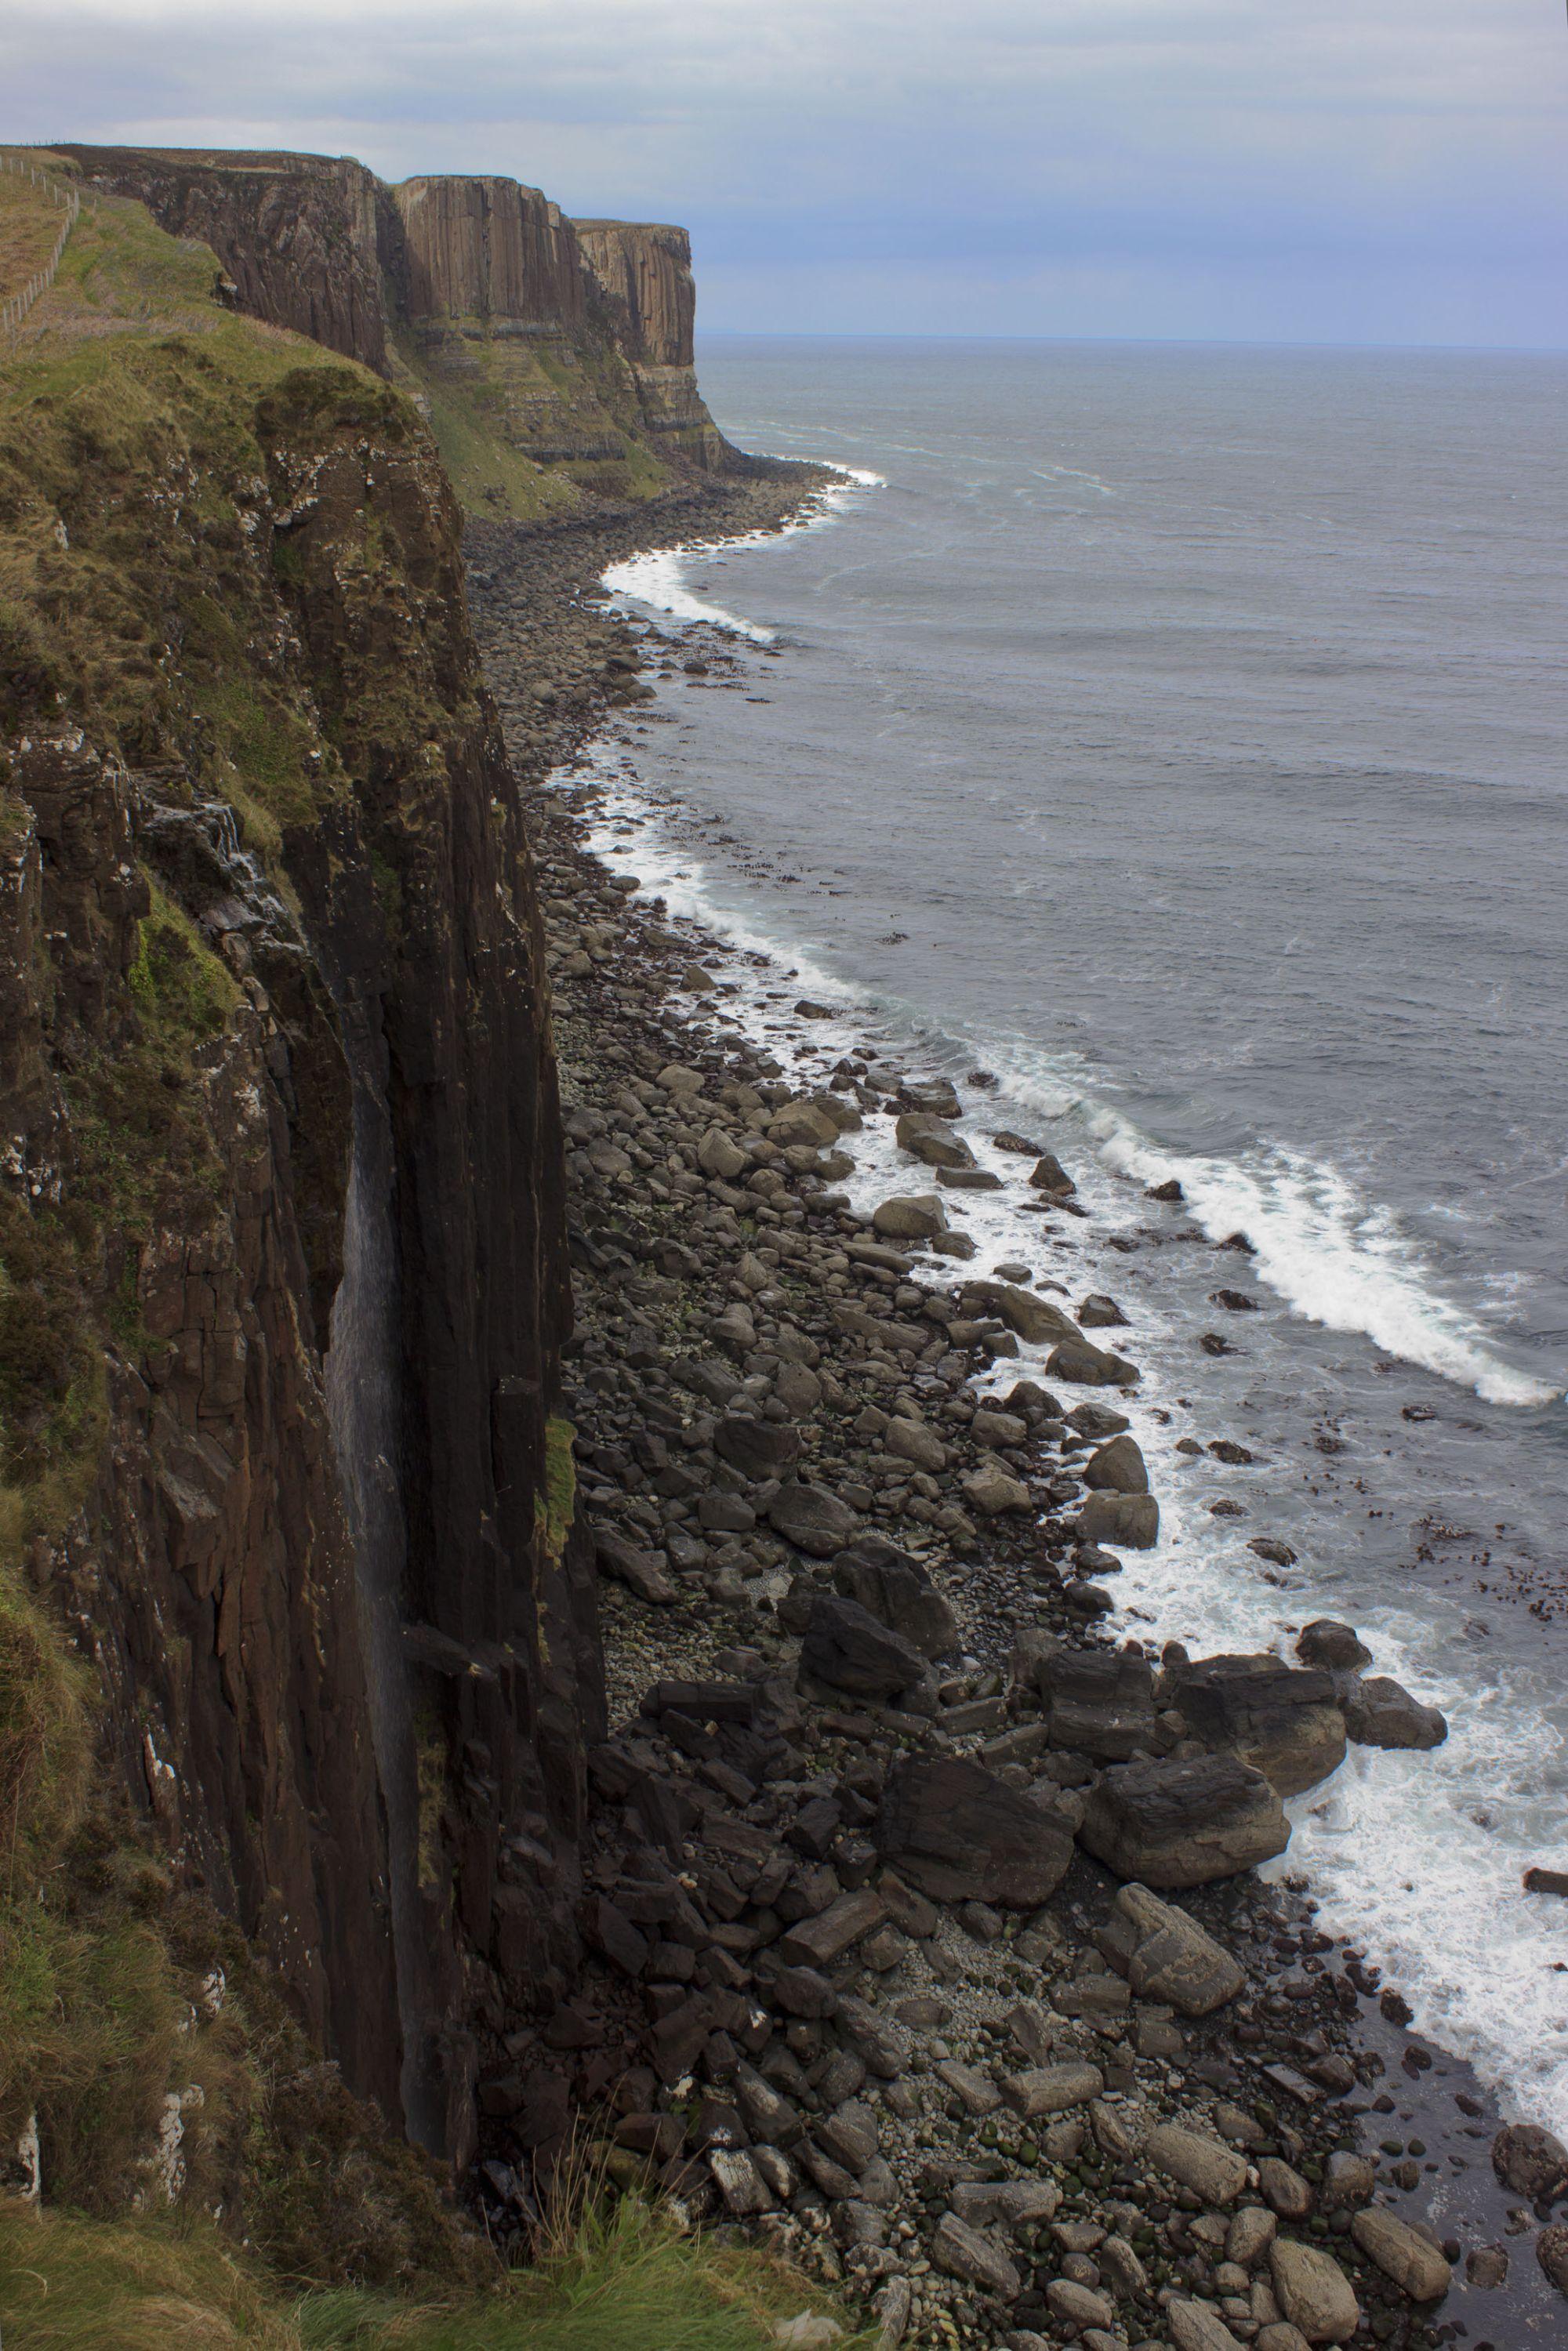 Kilt Rock viewpoint